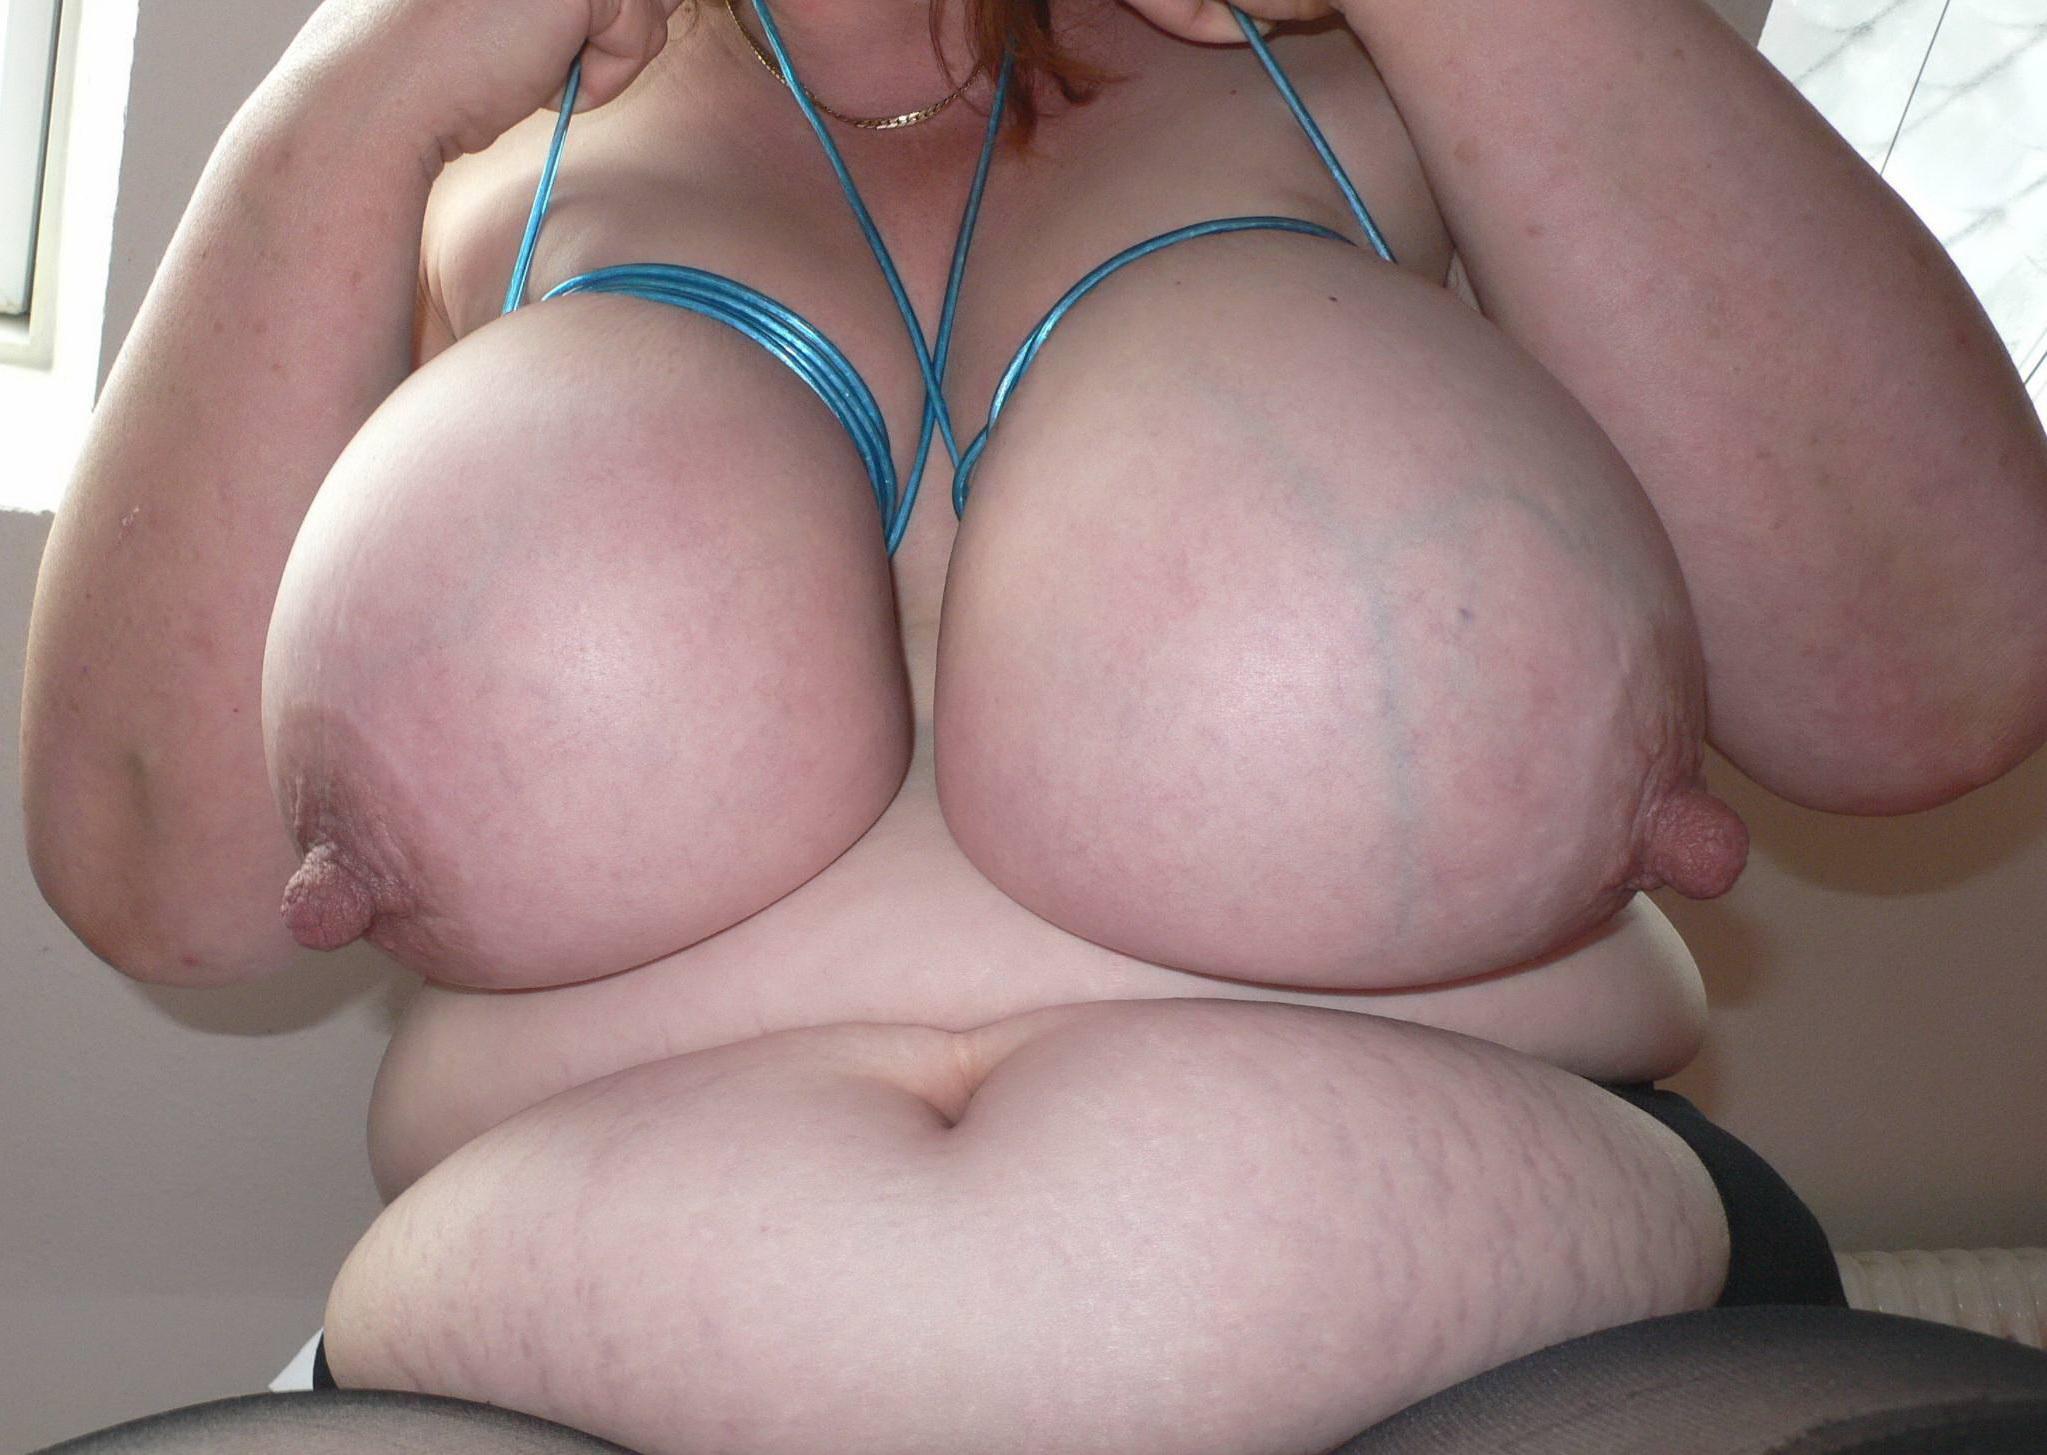 Толстушка большими соскам 16 фотография